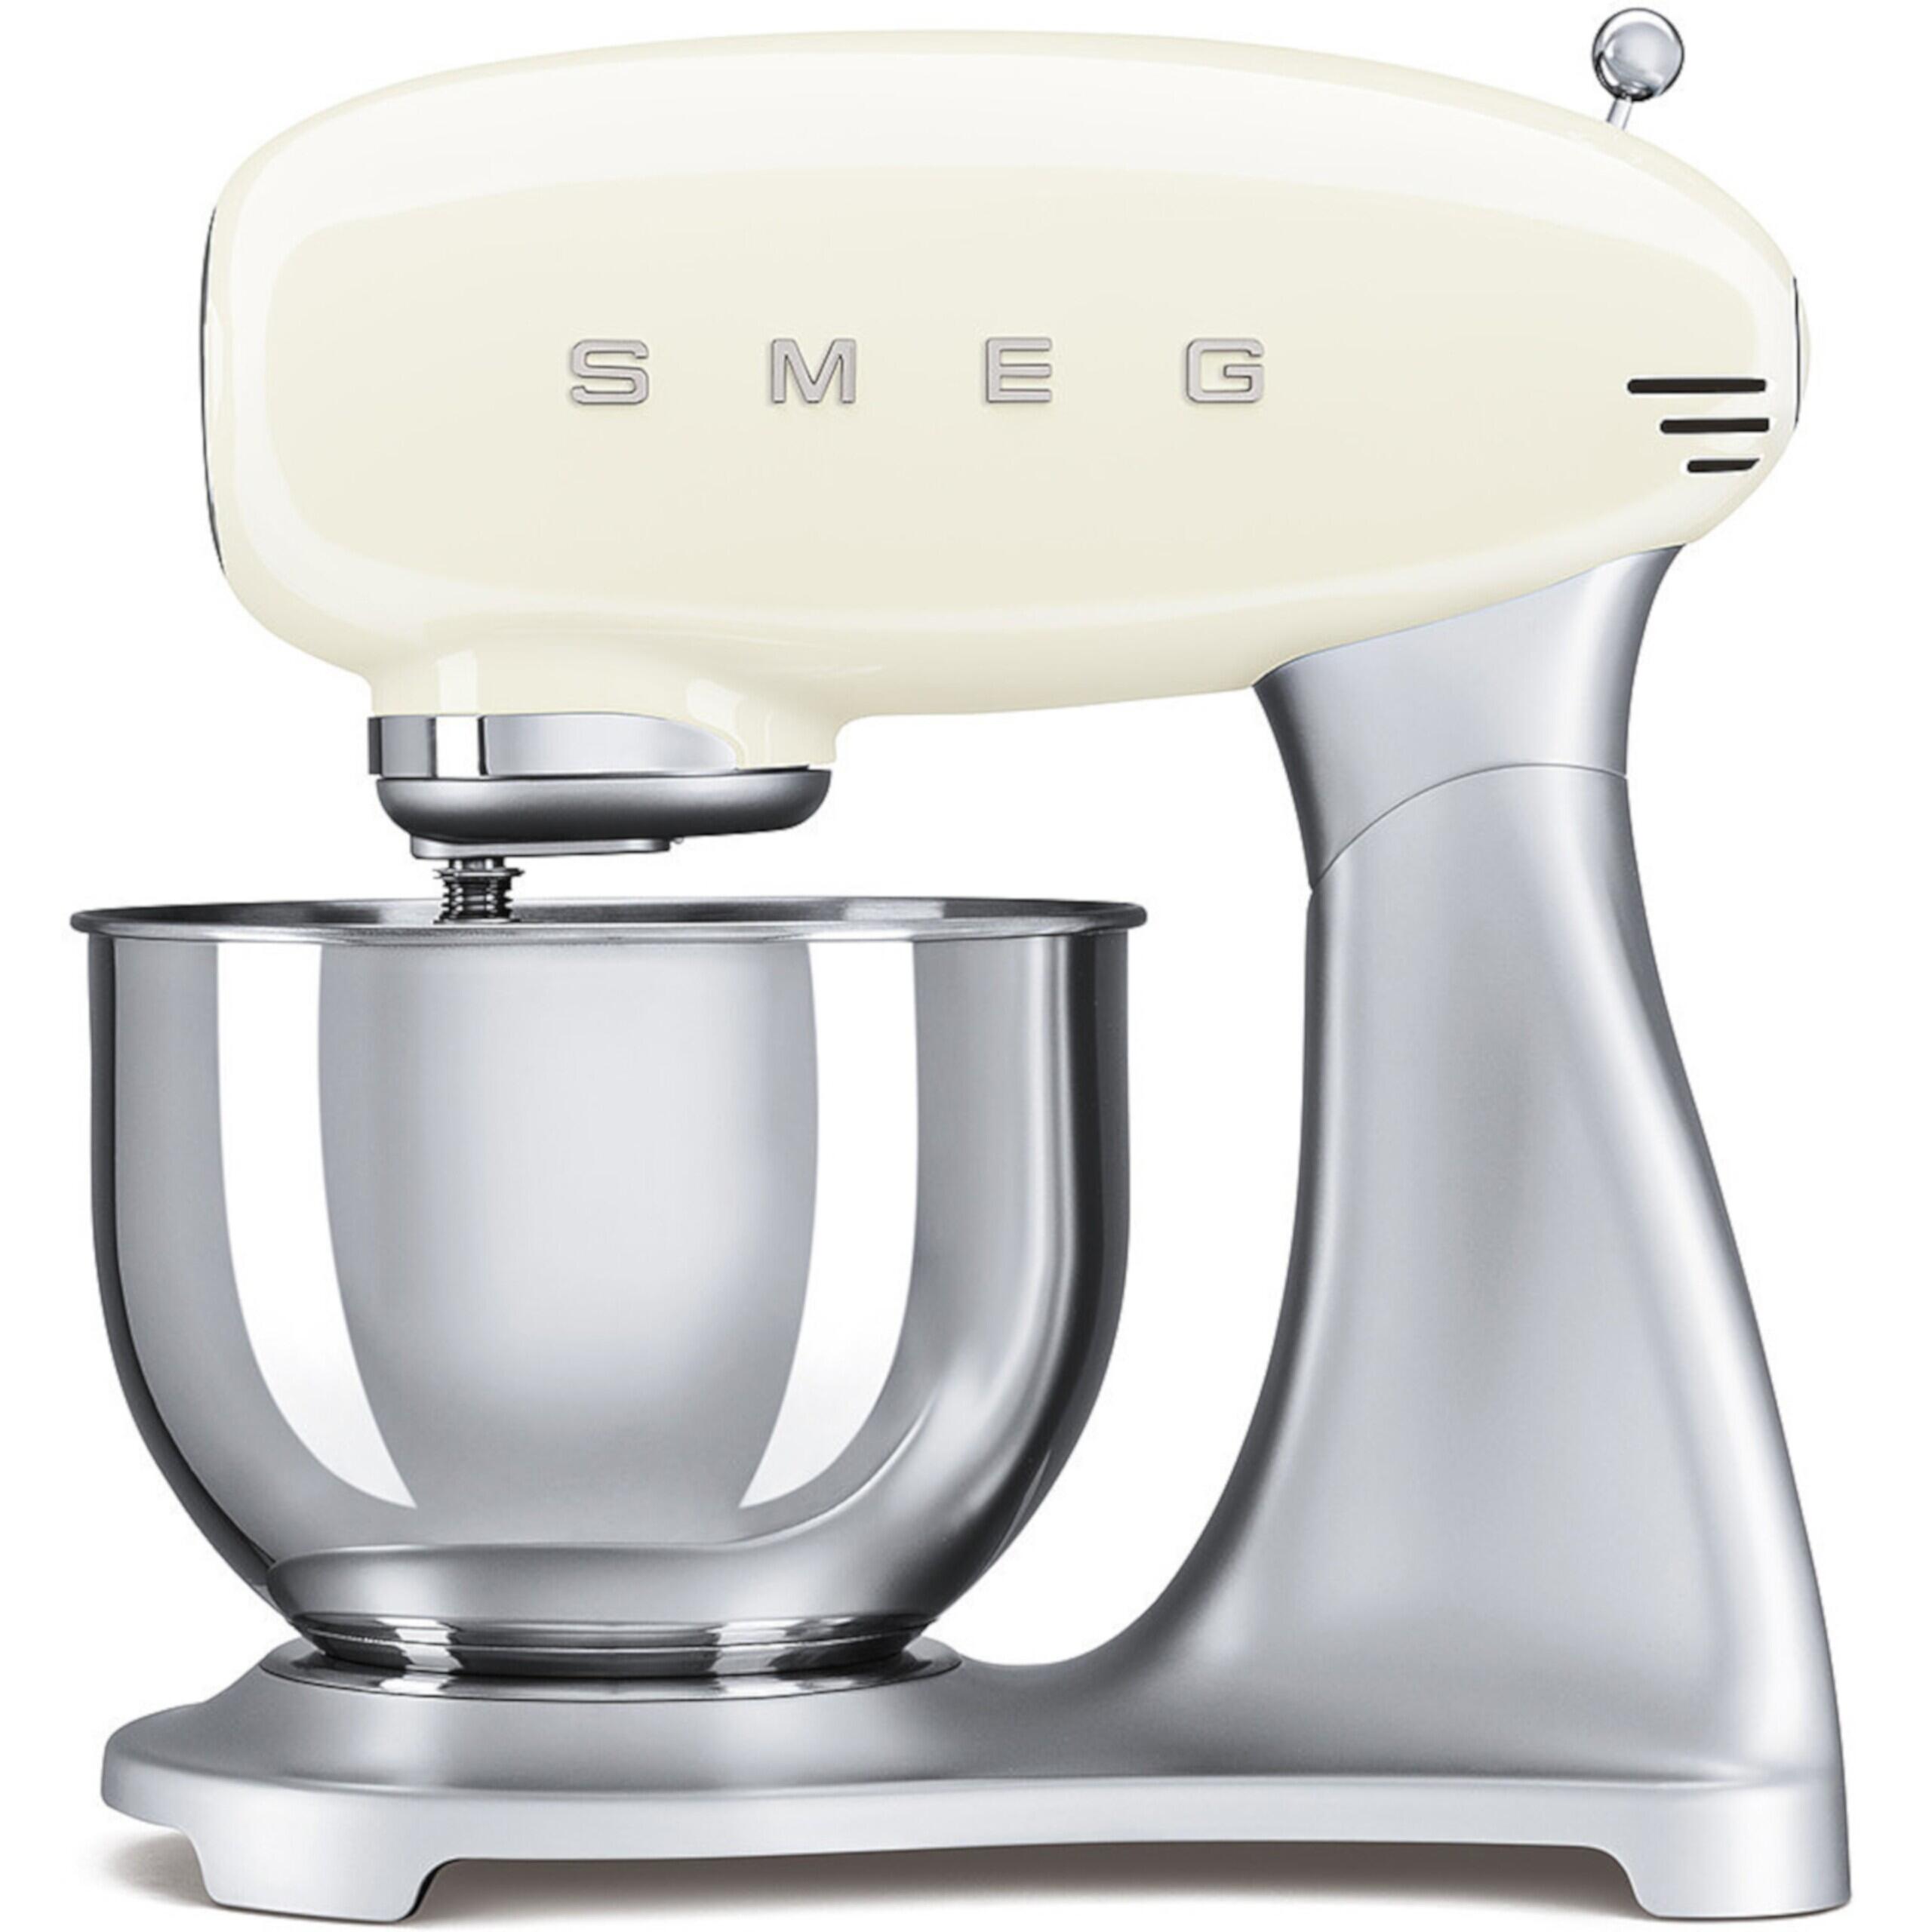 Smeg Kuchenmaschine 50 S Retro Style Creme